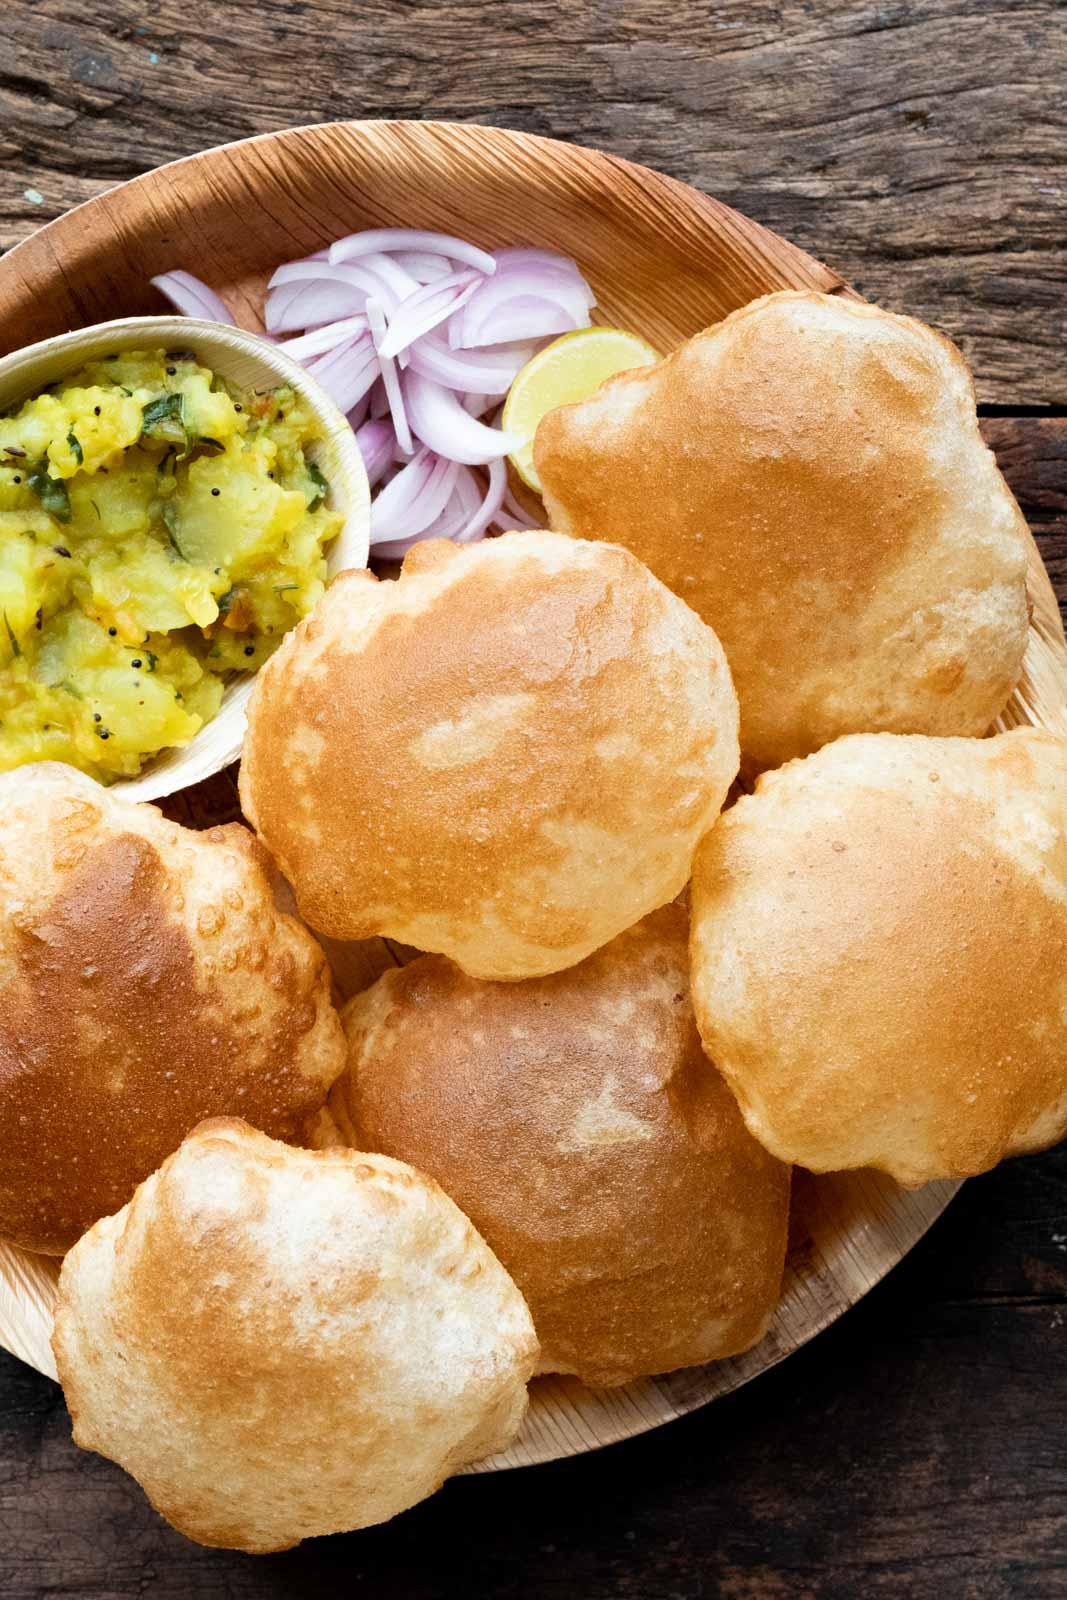 Pooris served on a plate with aloo bhaji, onions